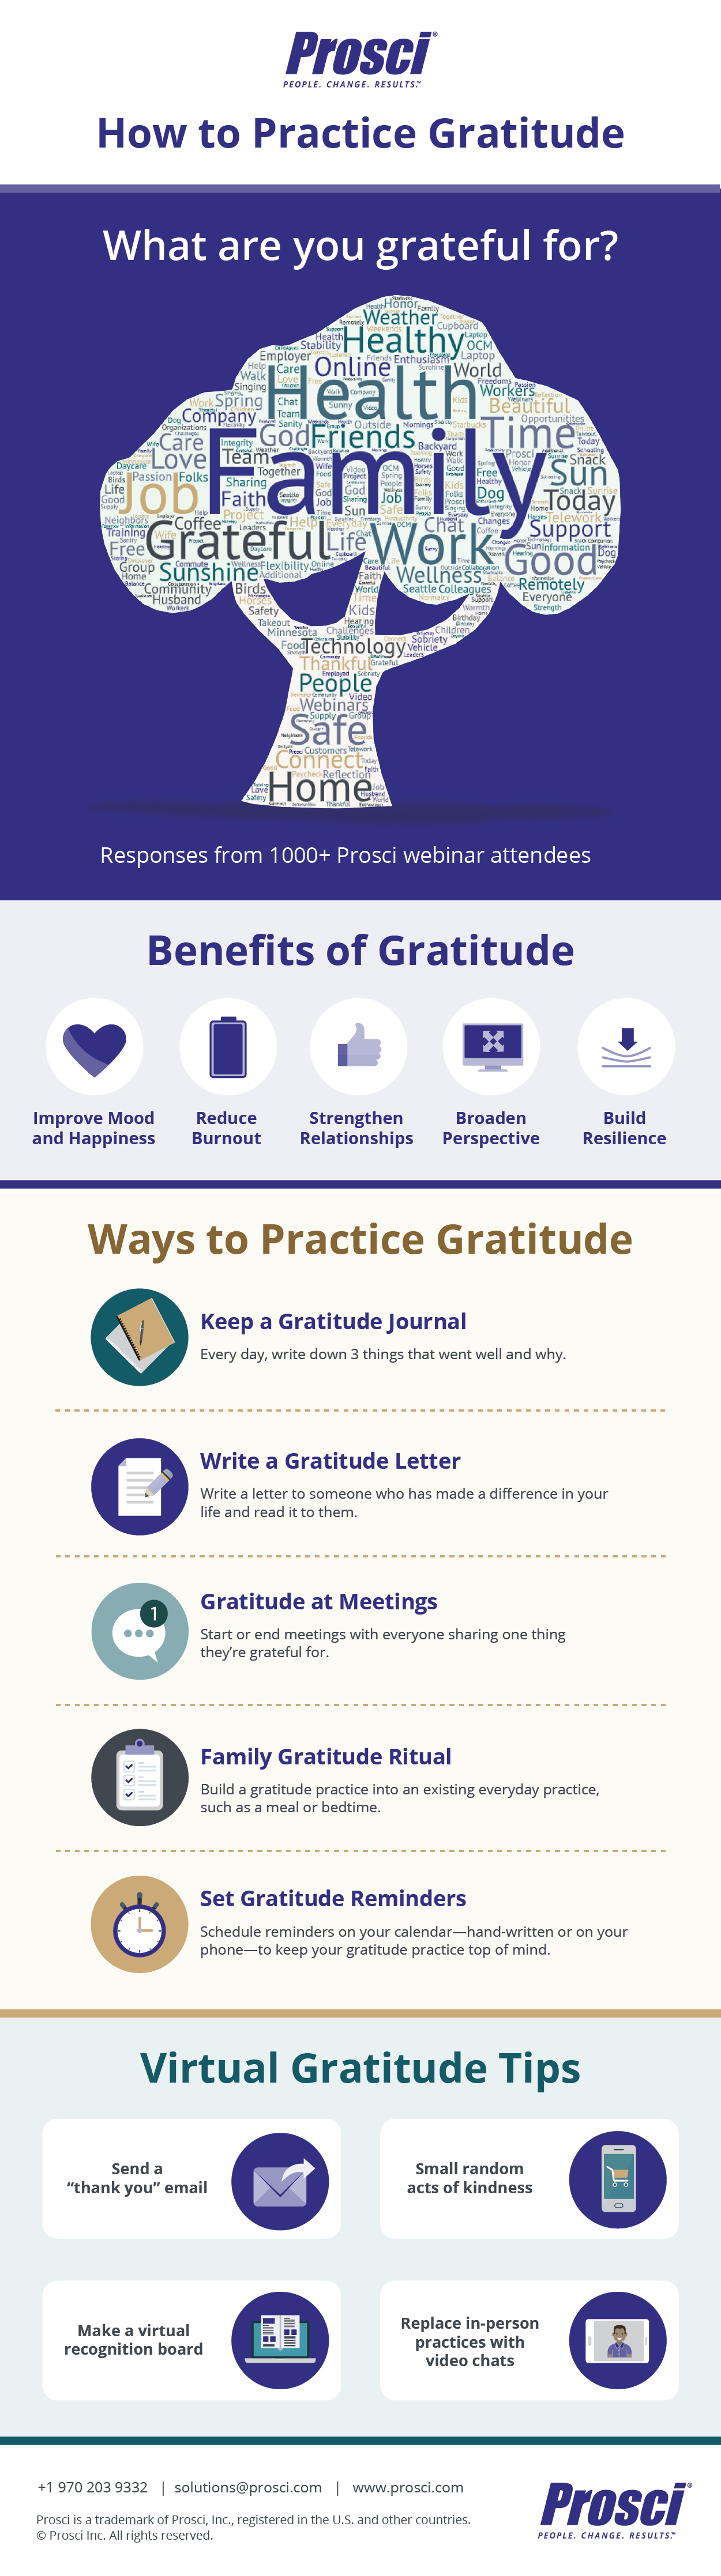 Prosci-Gratitude-Infographic-150dpi